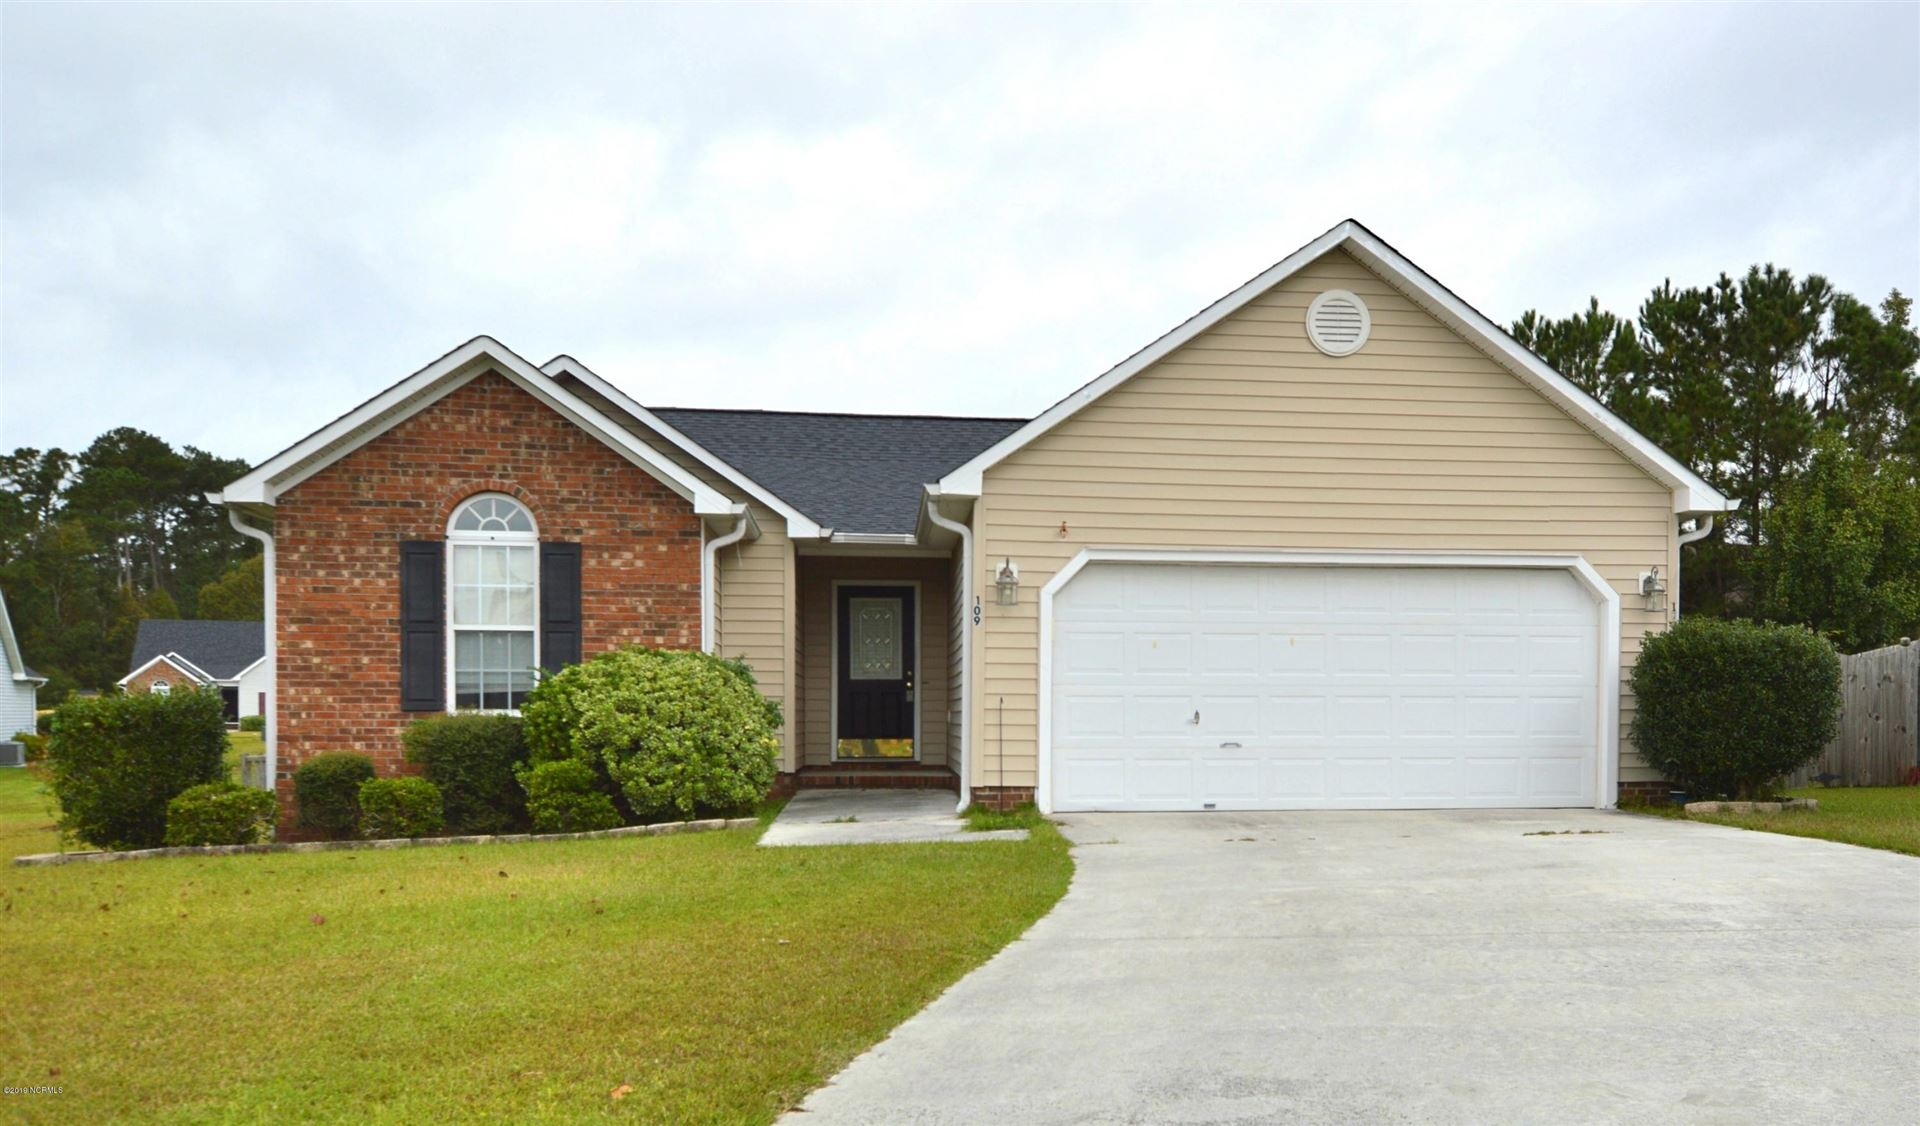 Photo of 109 Ridgewood Court, Jacksonville, NC 28546 (MLS # 100293037)